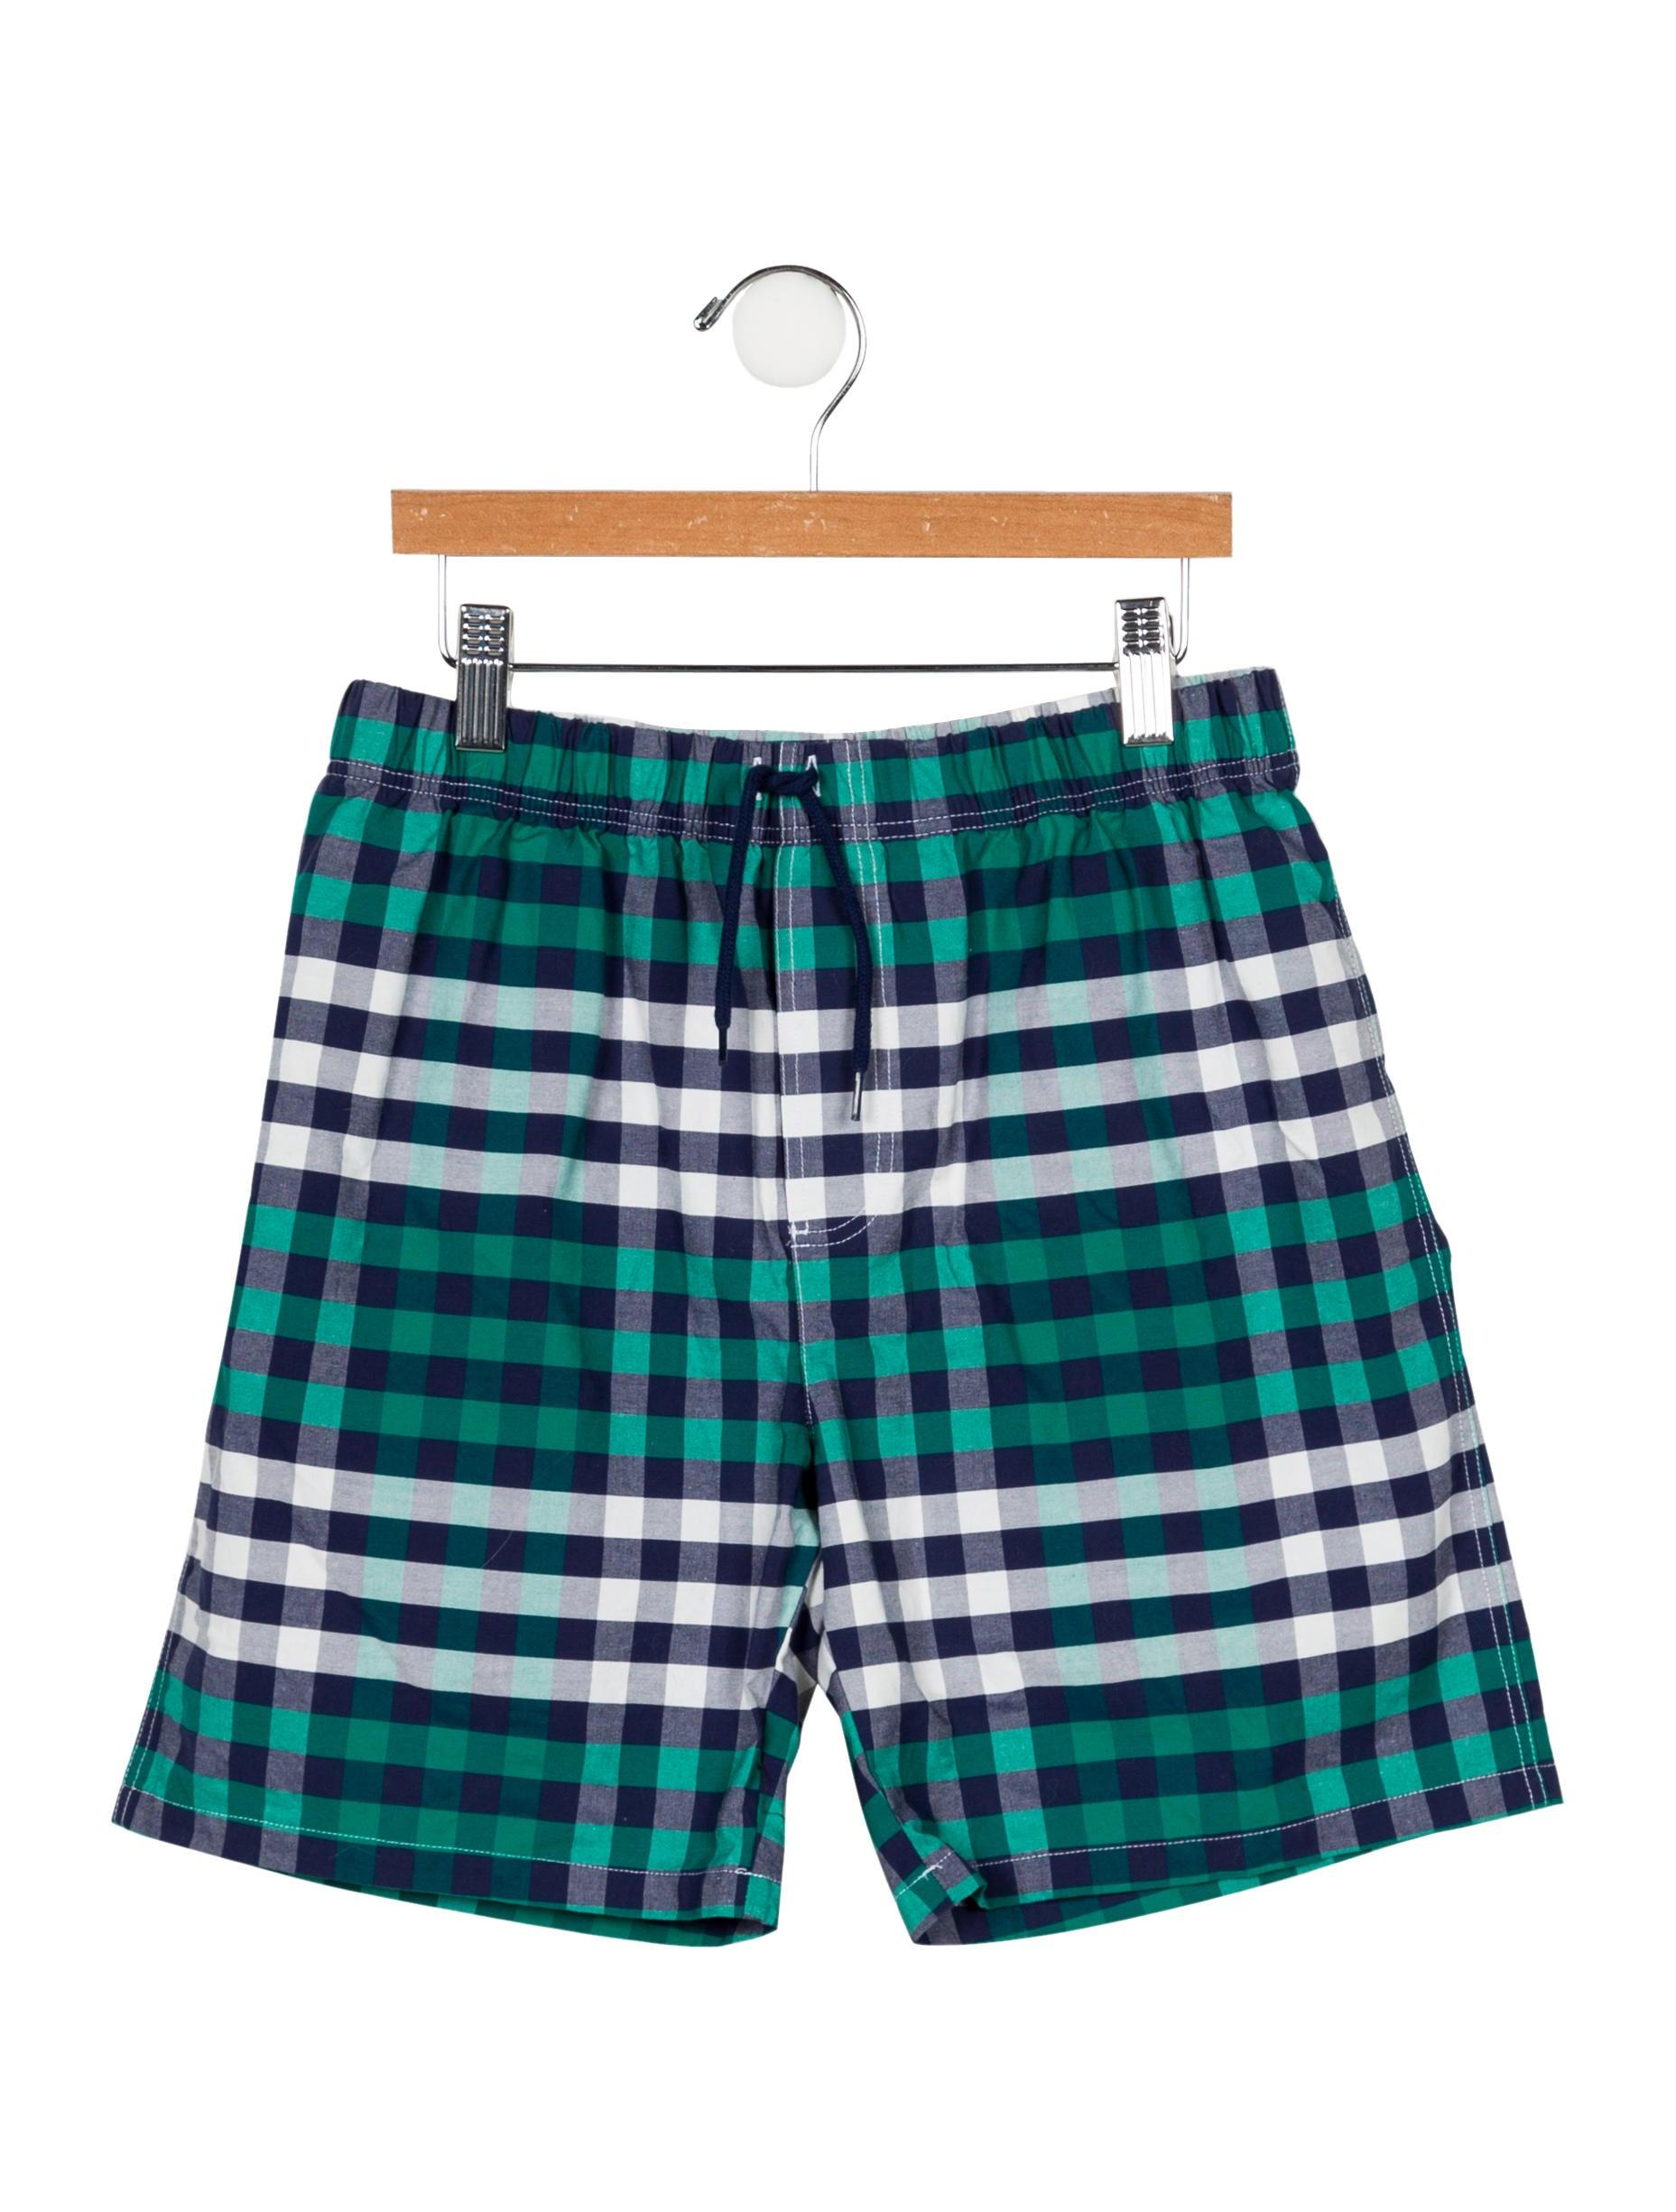 2c6d9649c87d7 Jacadi Boys' Checkered Swim Shorts - Boys - WJDCI27404 | The RealReal